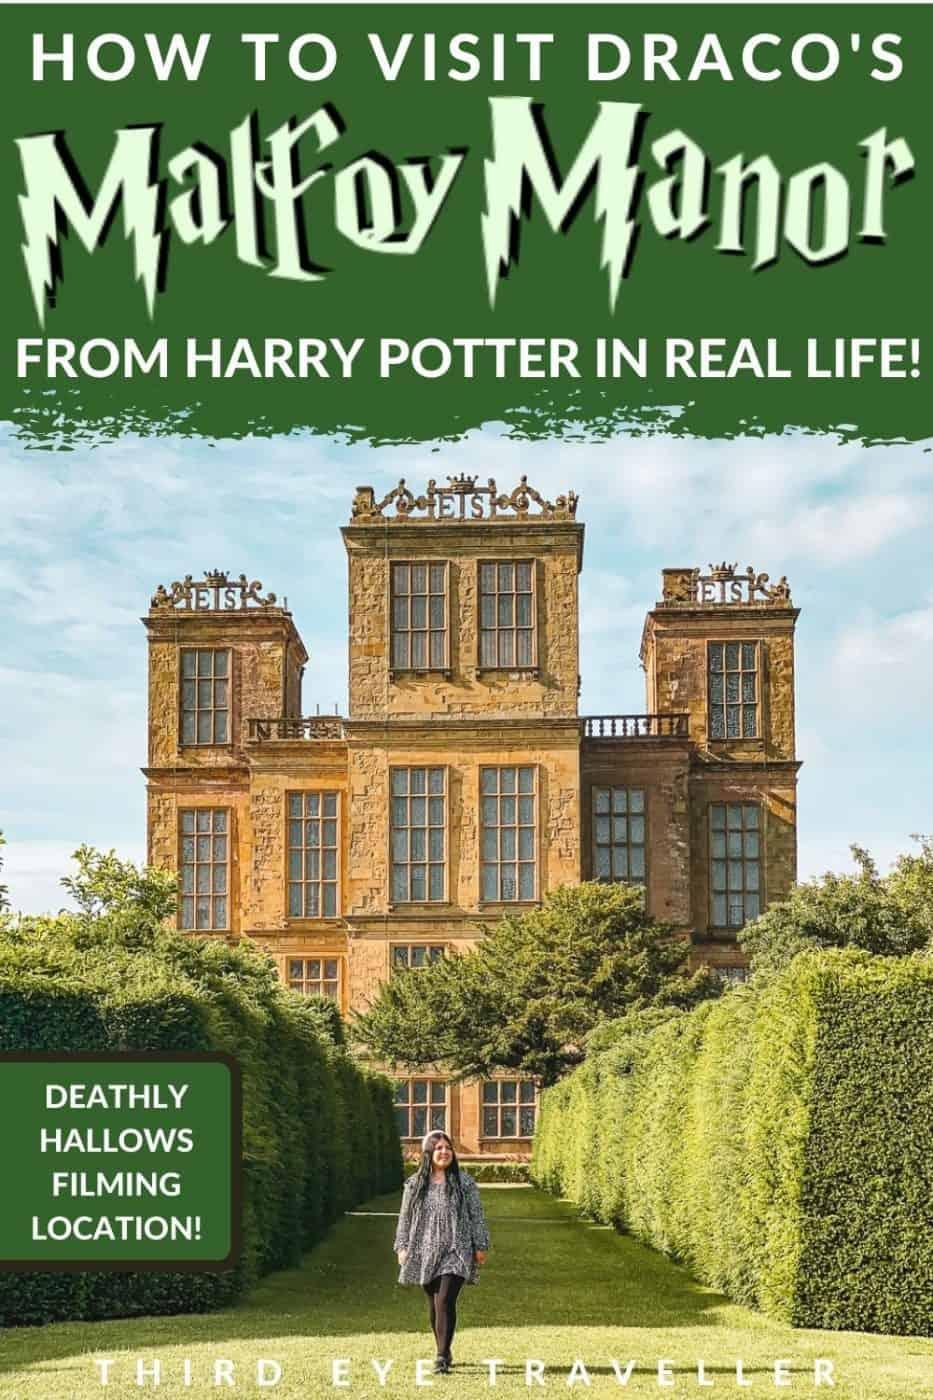 Harry Potter Hardwick Hall Malfoy Manor Filming Location - real Malfoy Manor location